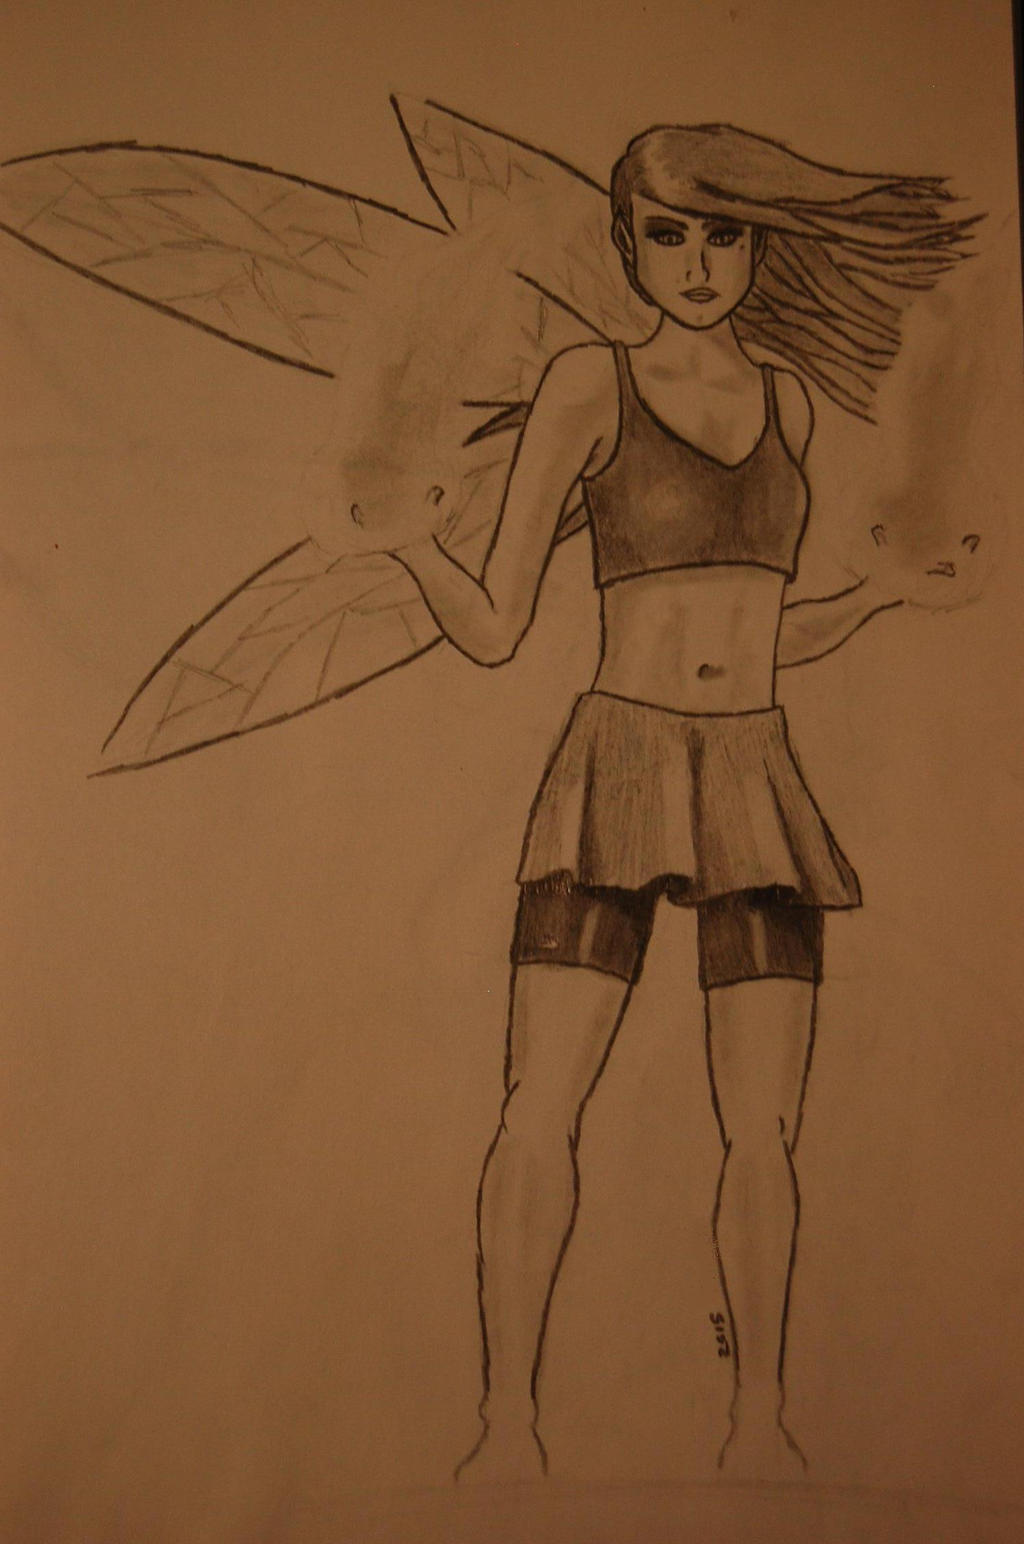 Fairy by maxpinkie